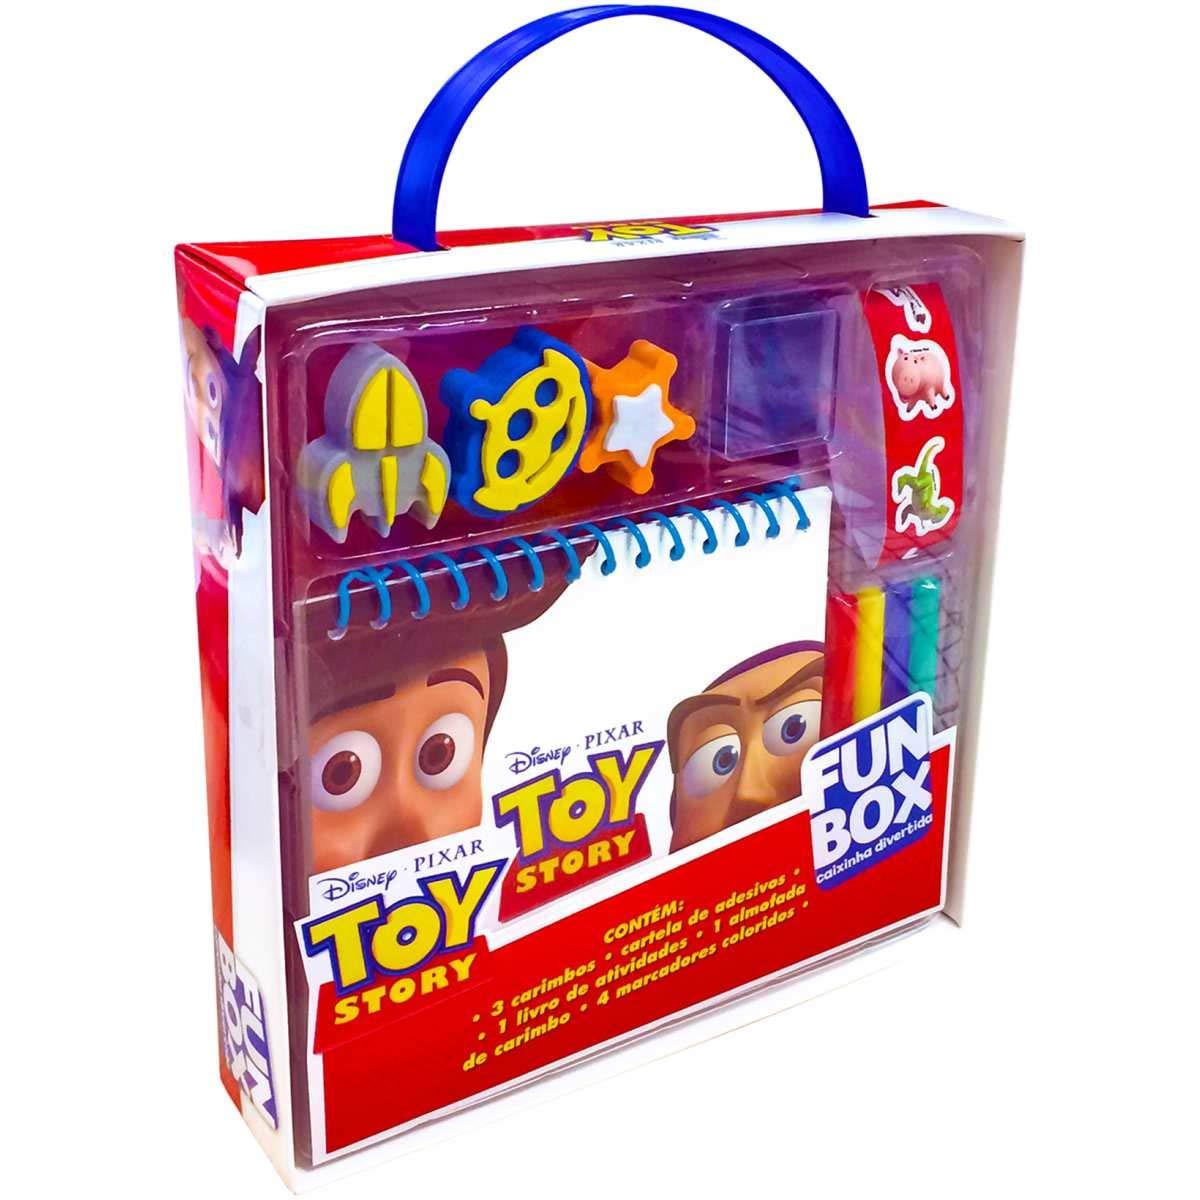 Disney Toy Story Caixa Colecao Fun Box Varios Autores